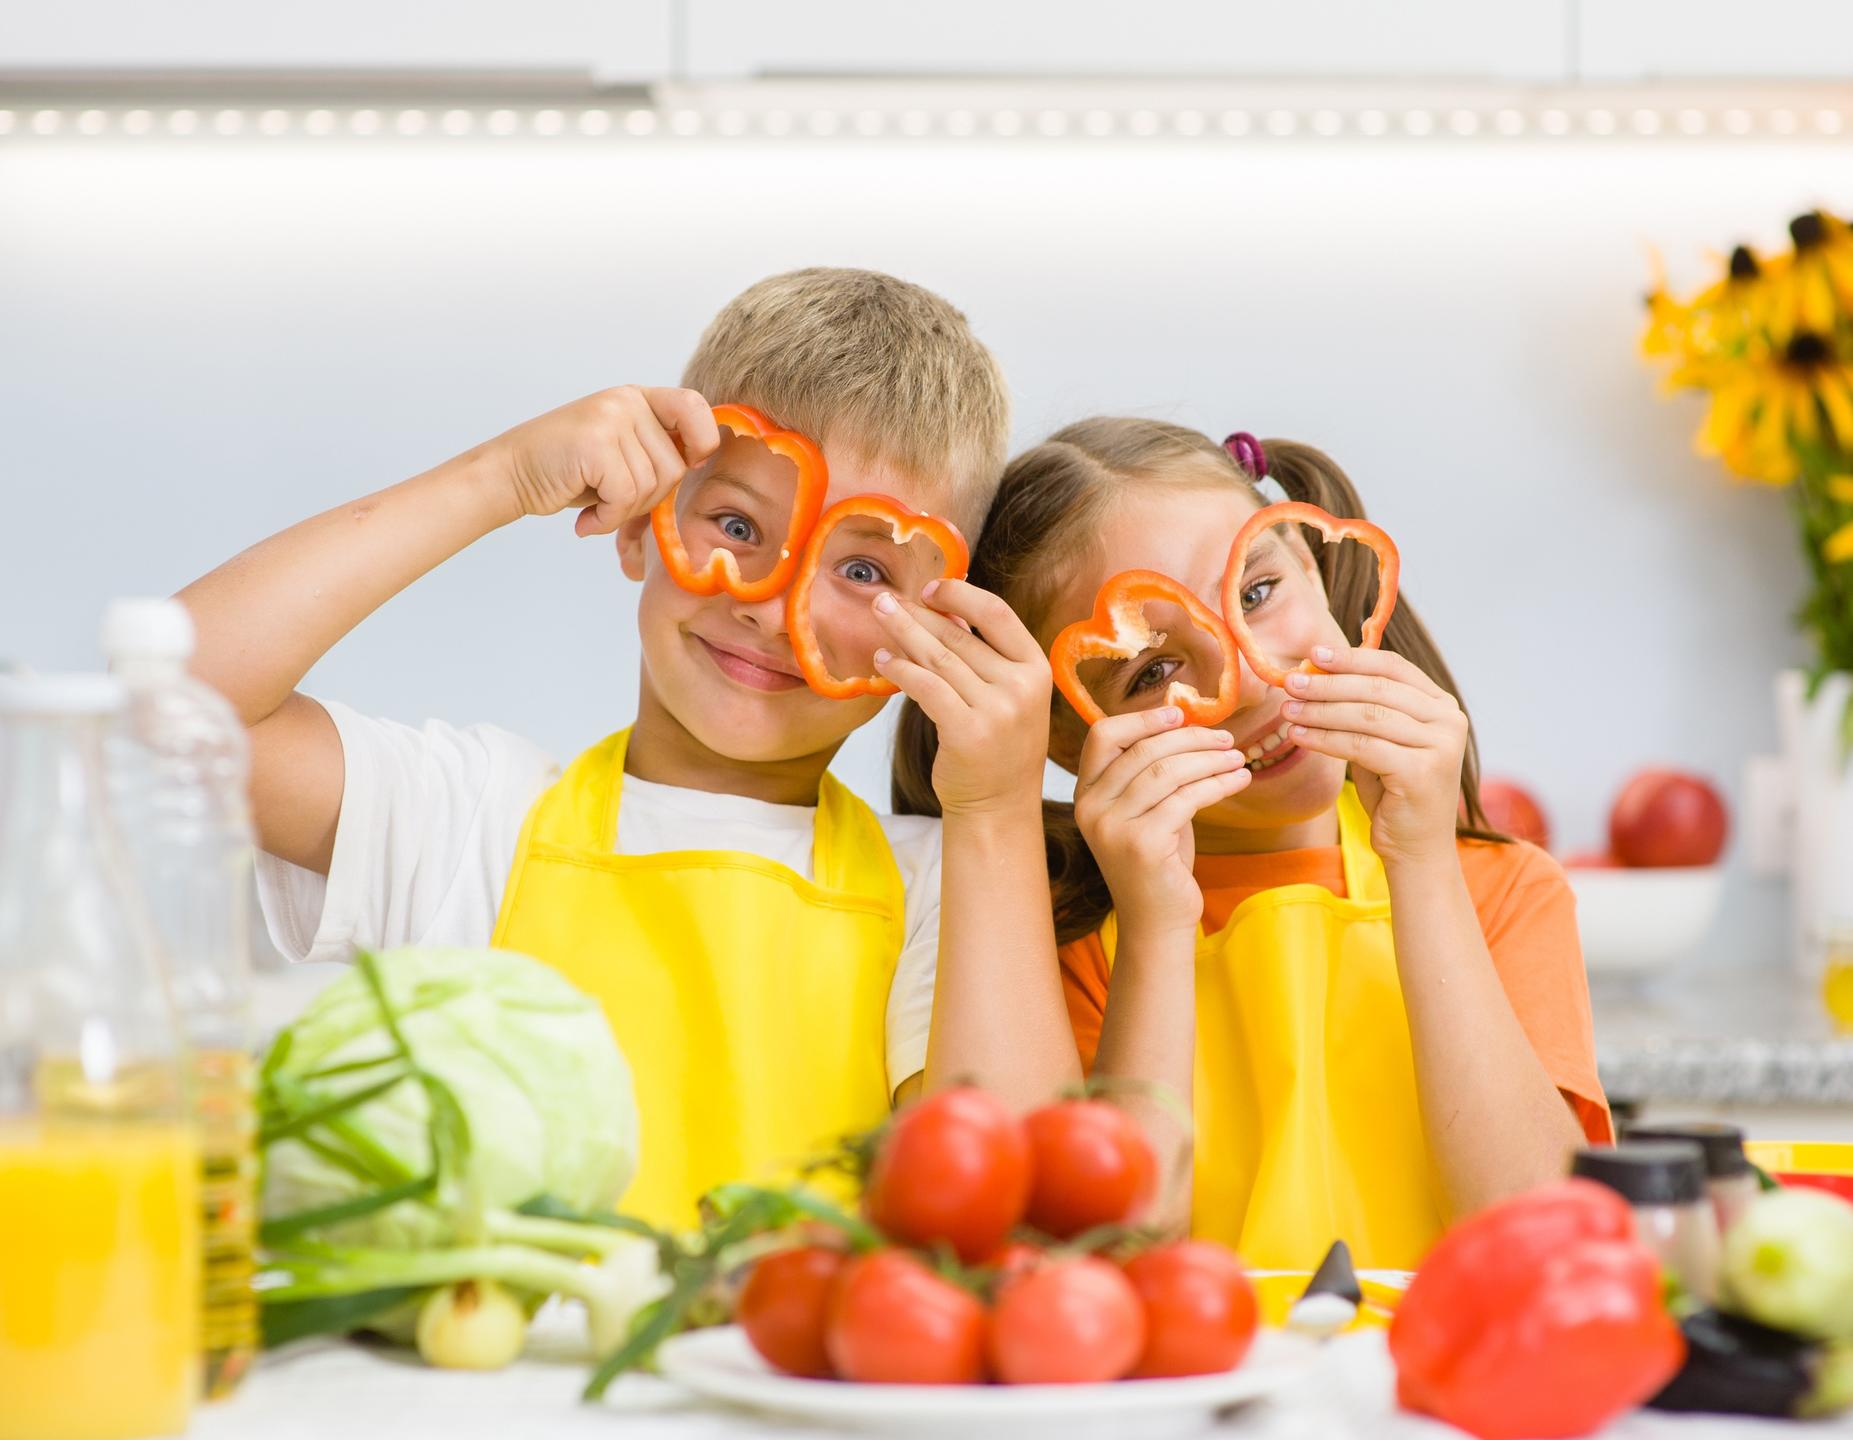 vegan kids with vegetables